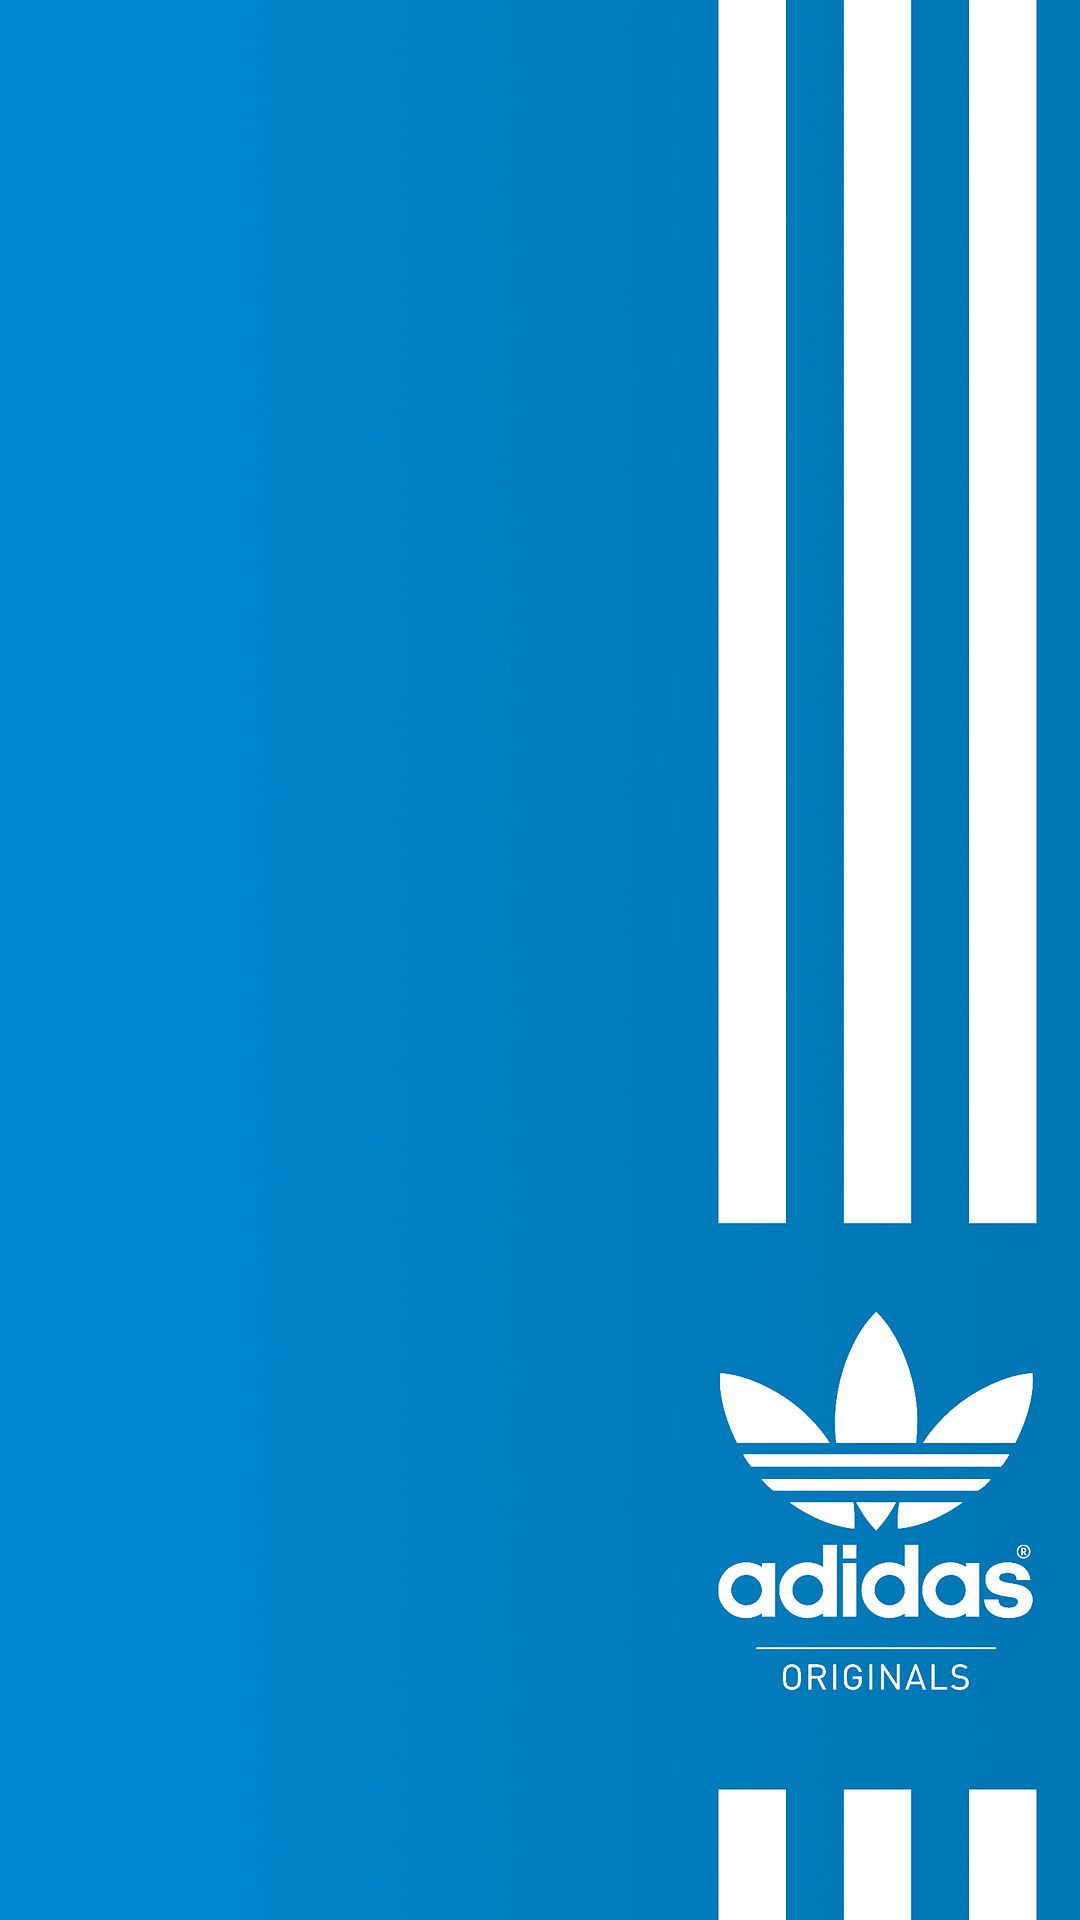 Adidas Originals Wallpapers Top Free Adidas Originals